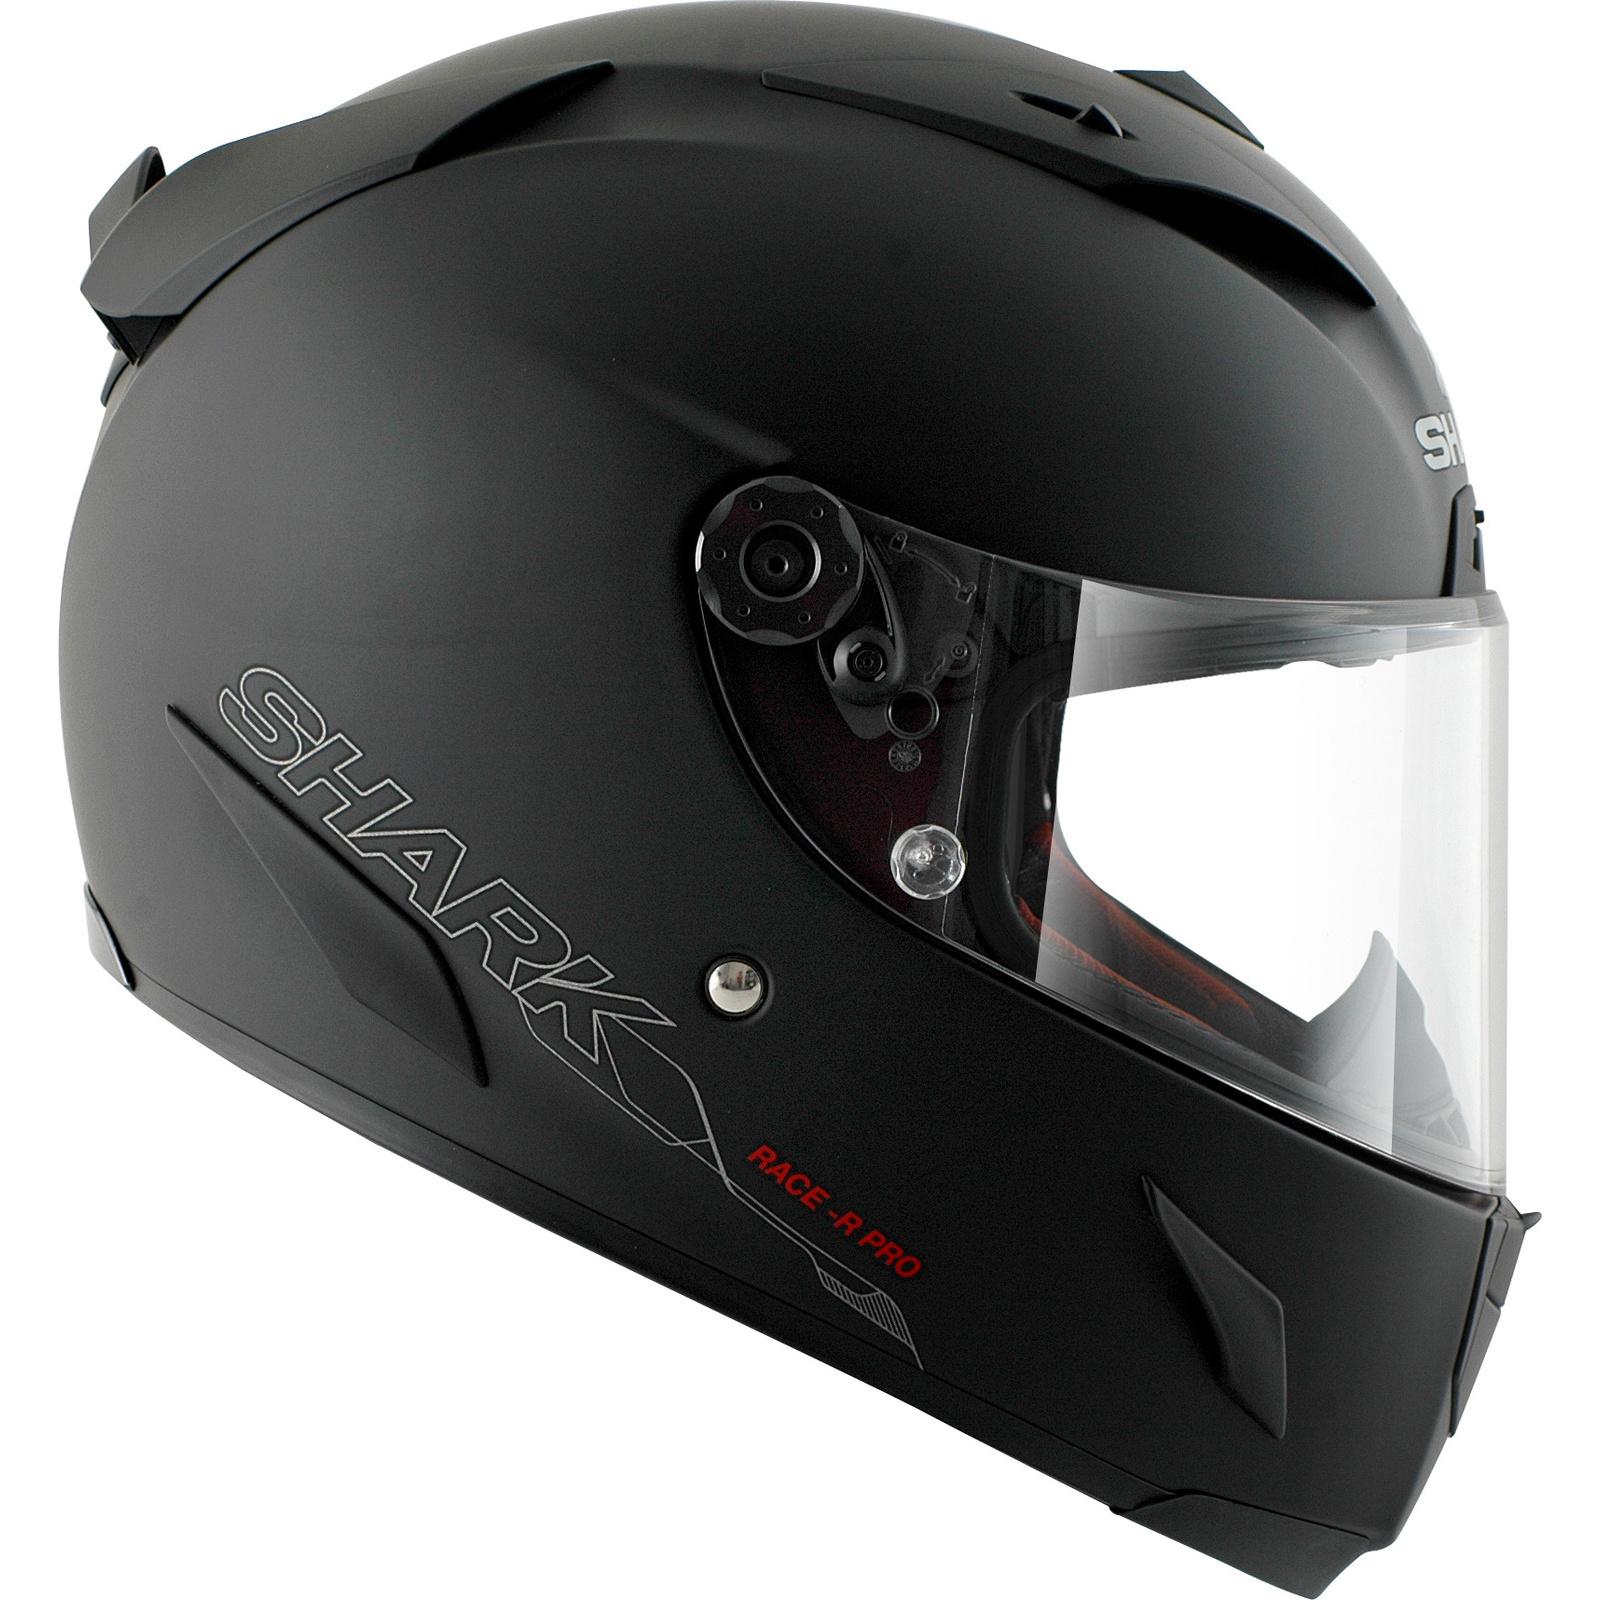 shark race r pro blank matt black motorcycle helmet visor crash protection ebay. Black Bedroom Furniture Sets. Home Design Ideas